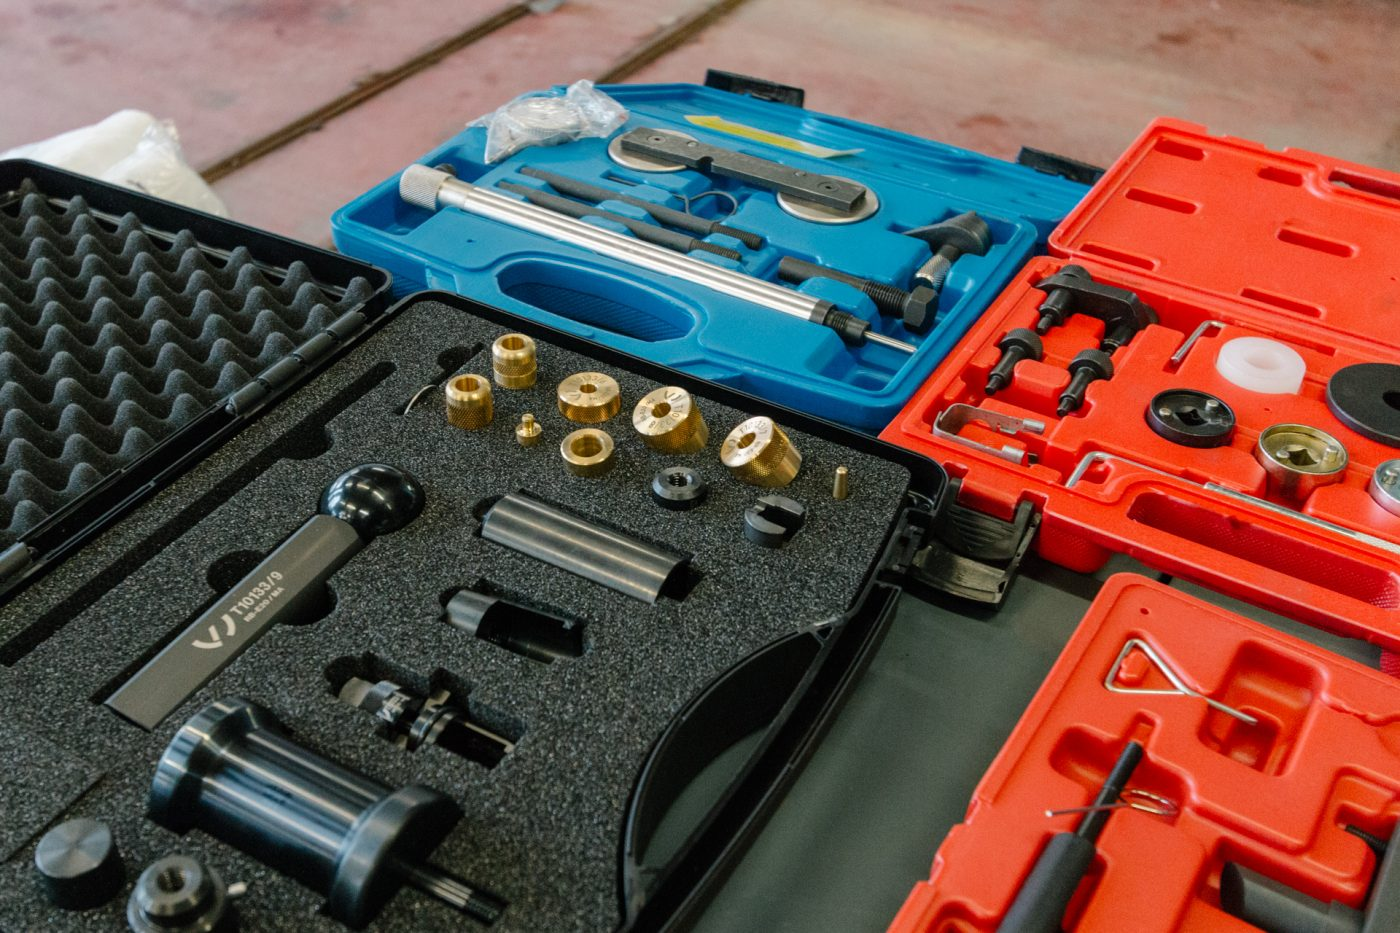 Diesel injector removal tools